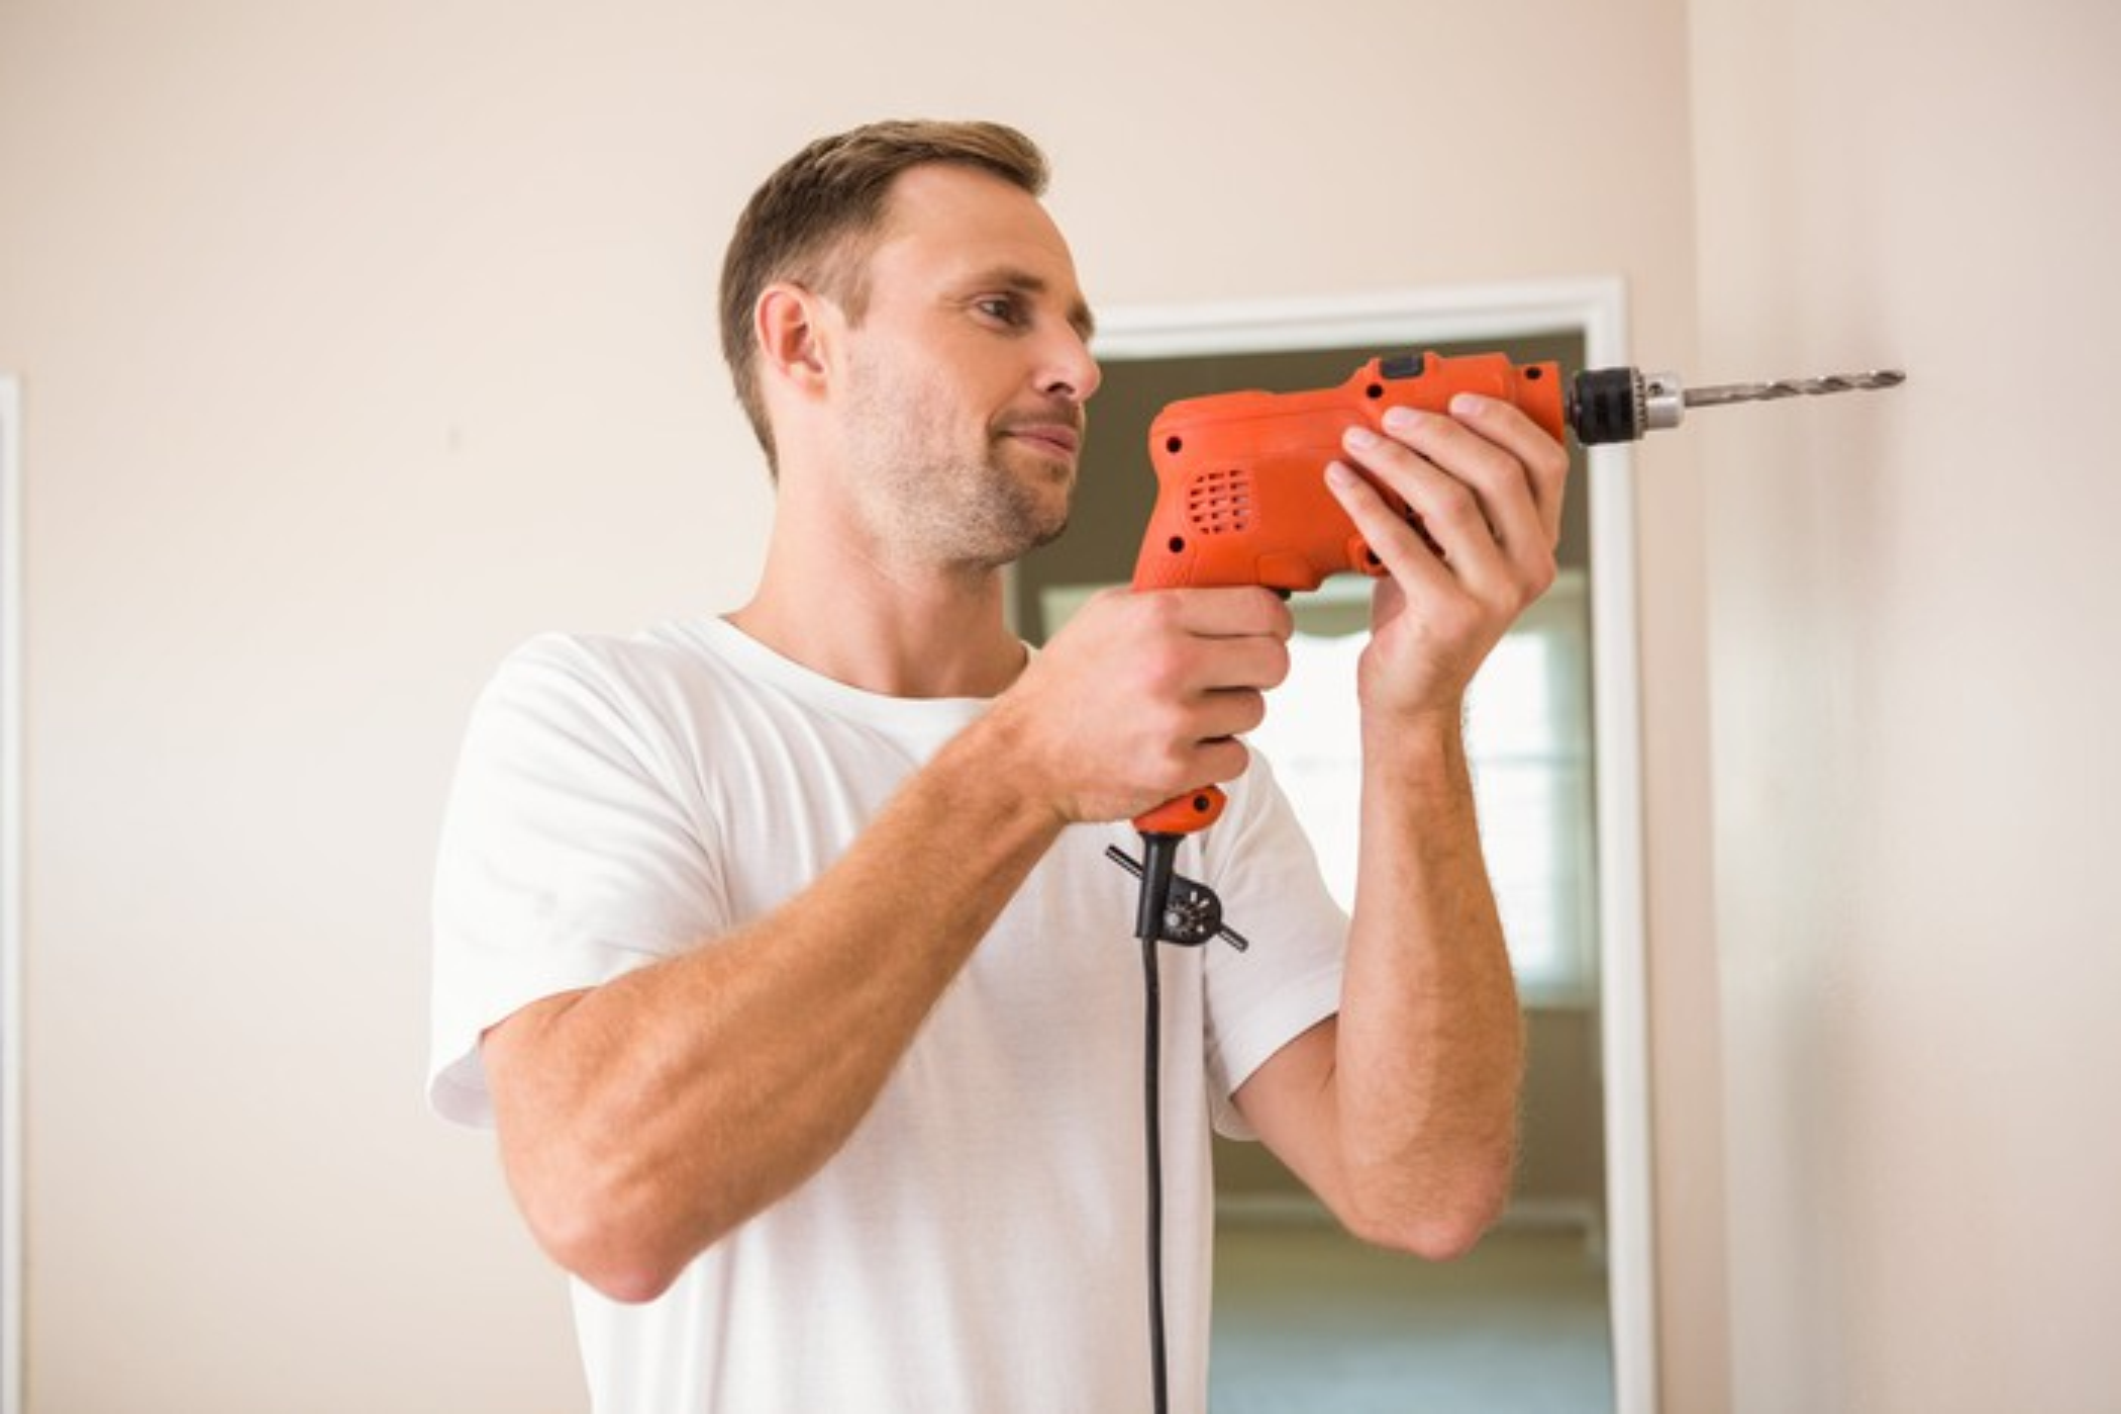 A man using a power drill.